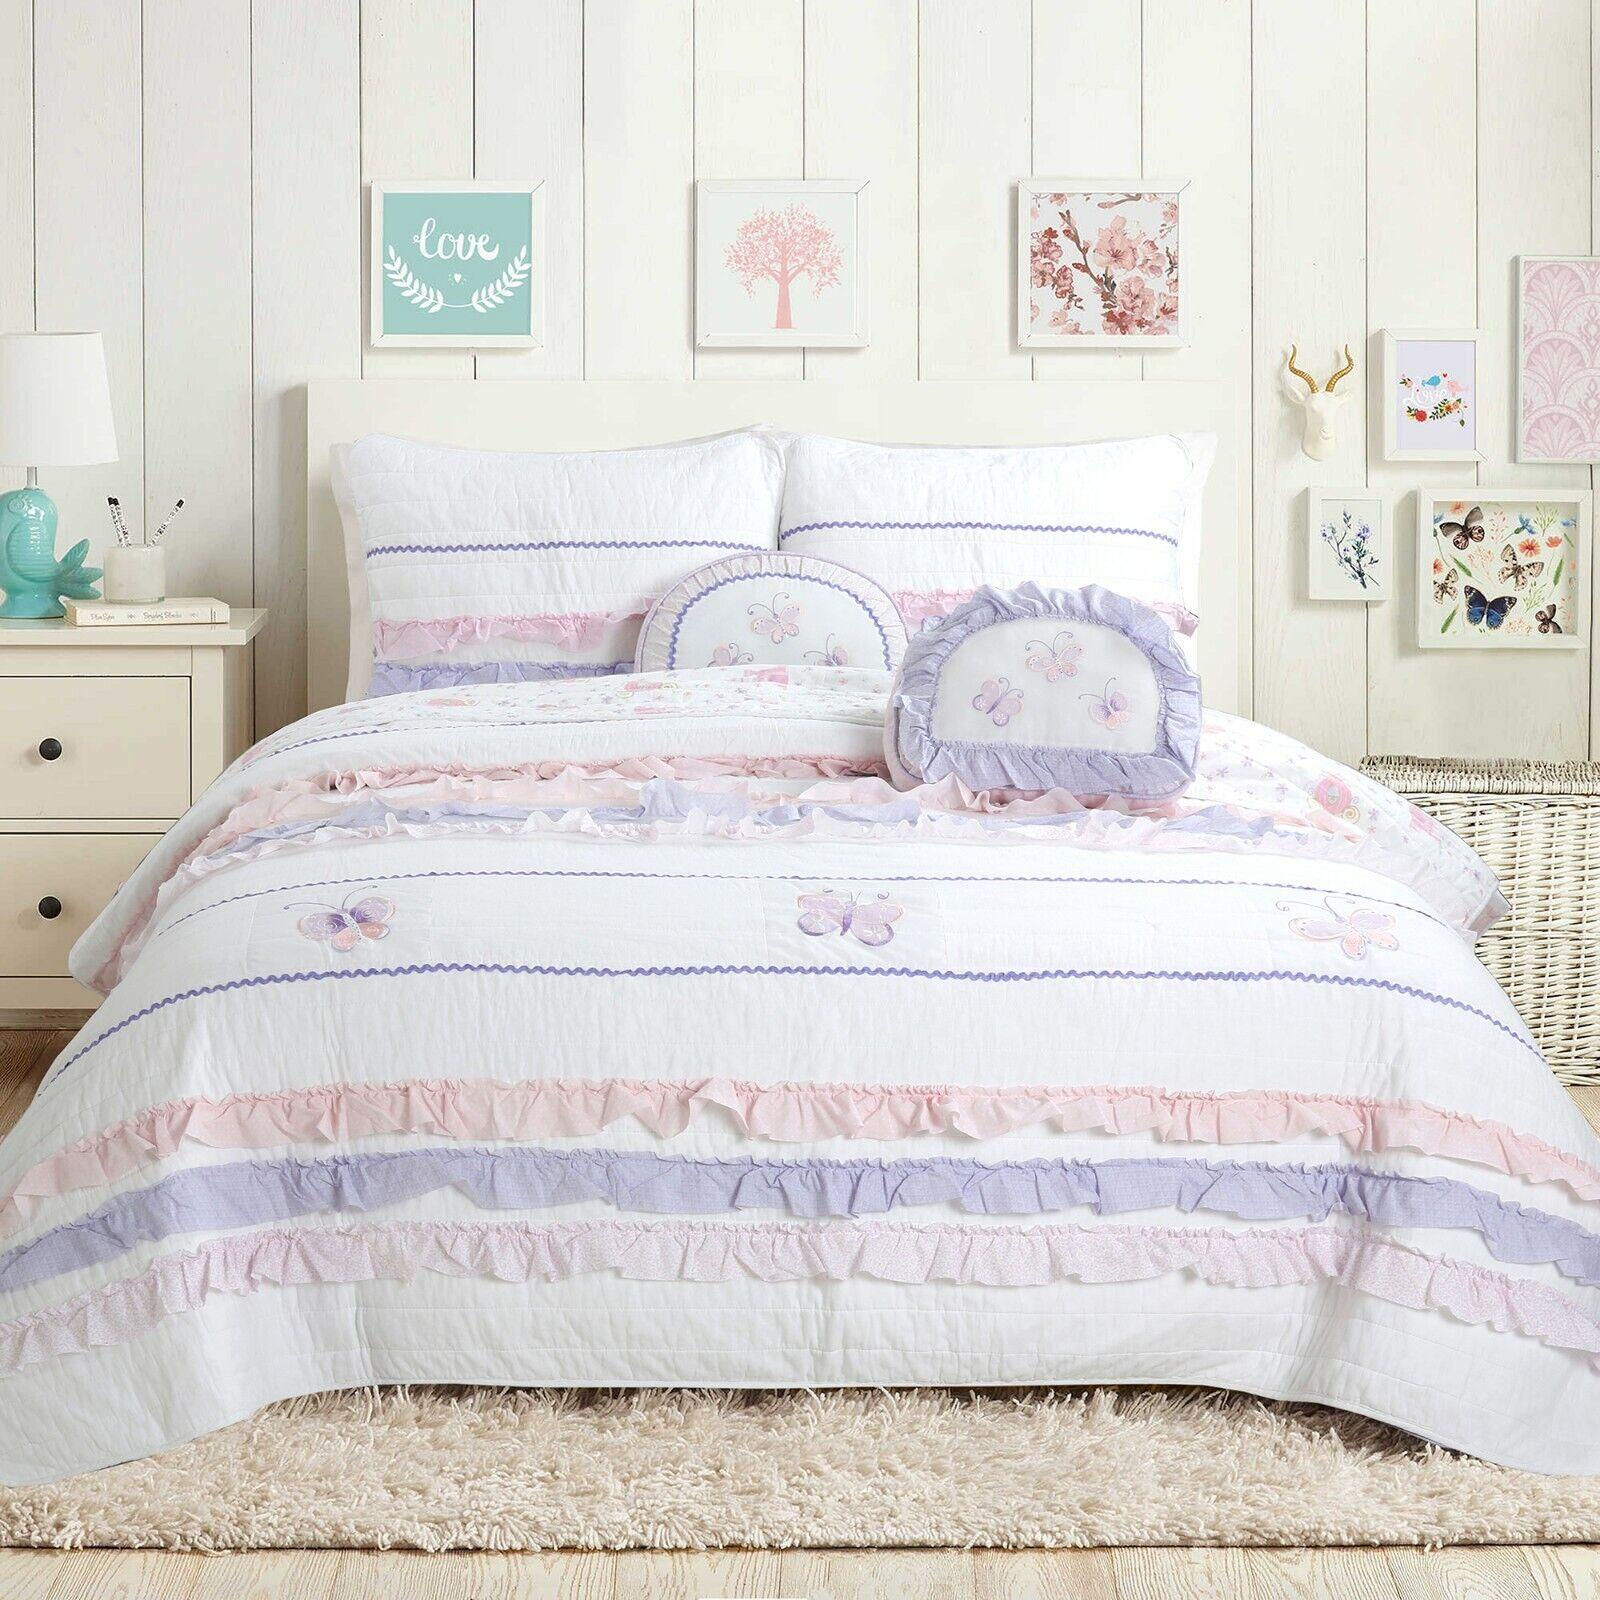 Diboll Ruffle Lace Cotton 100%Cotton Quilt Set, Bedspread, Coverlet